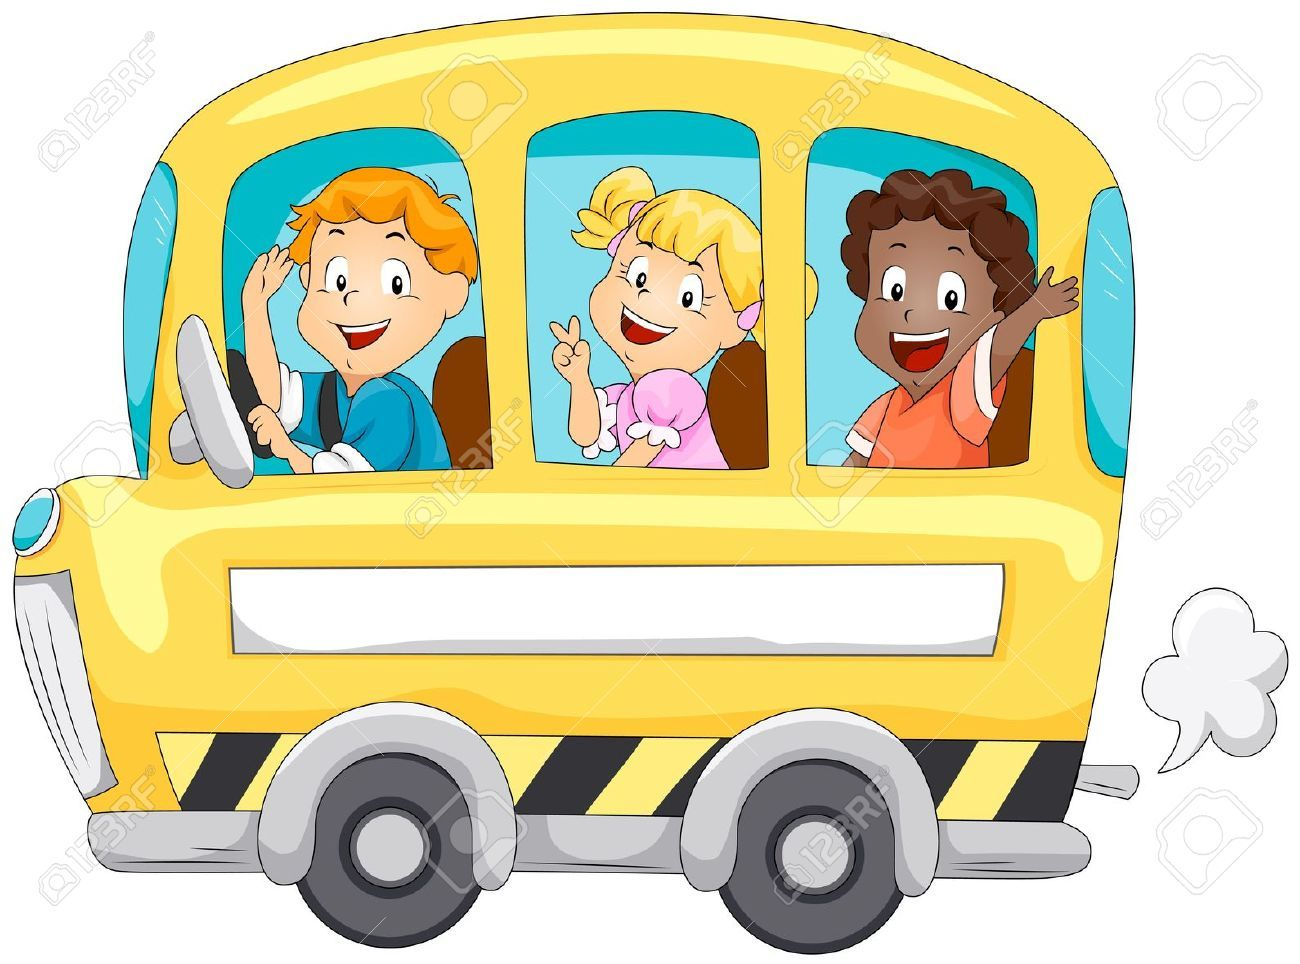 Clipart Wallpaper Blink Bus Clipart Child 4 1300 X 964 For Android Windows Mac And Xbox Onibus Escolar Autocarros Escolares Onibus